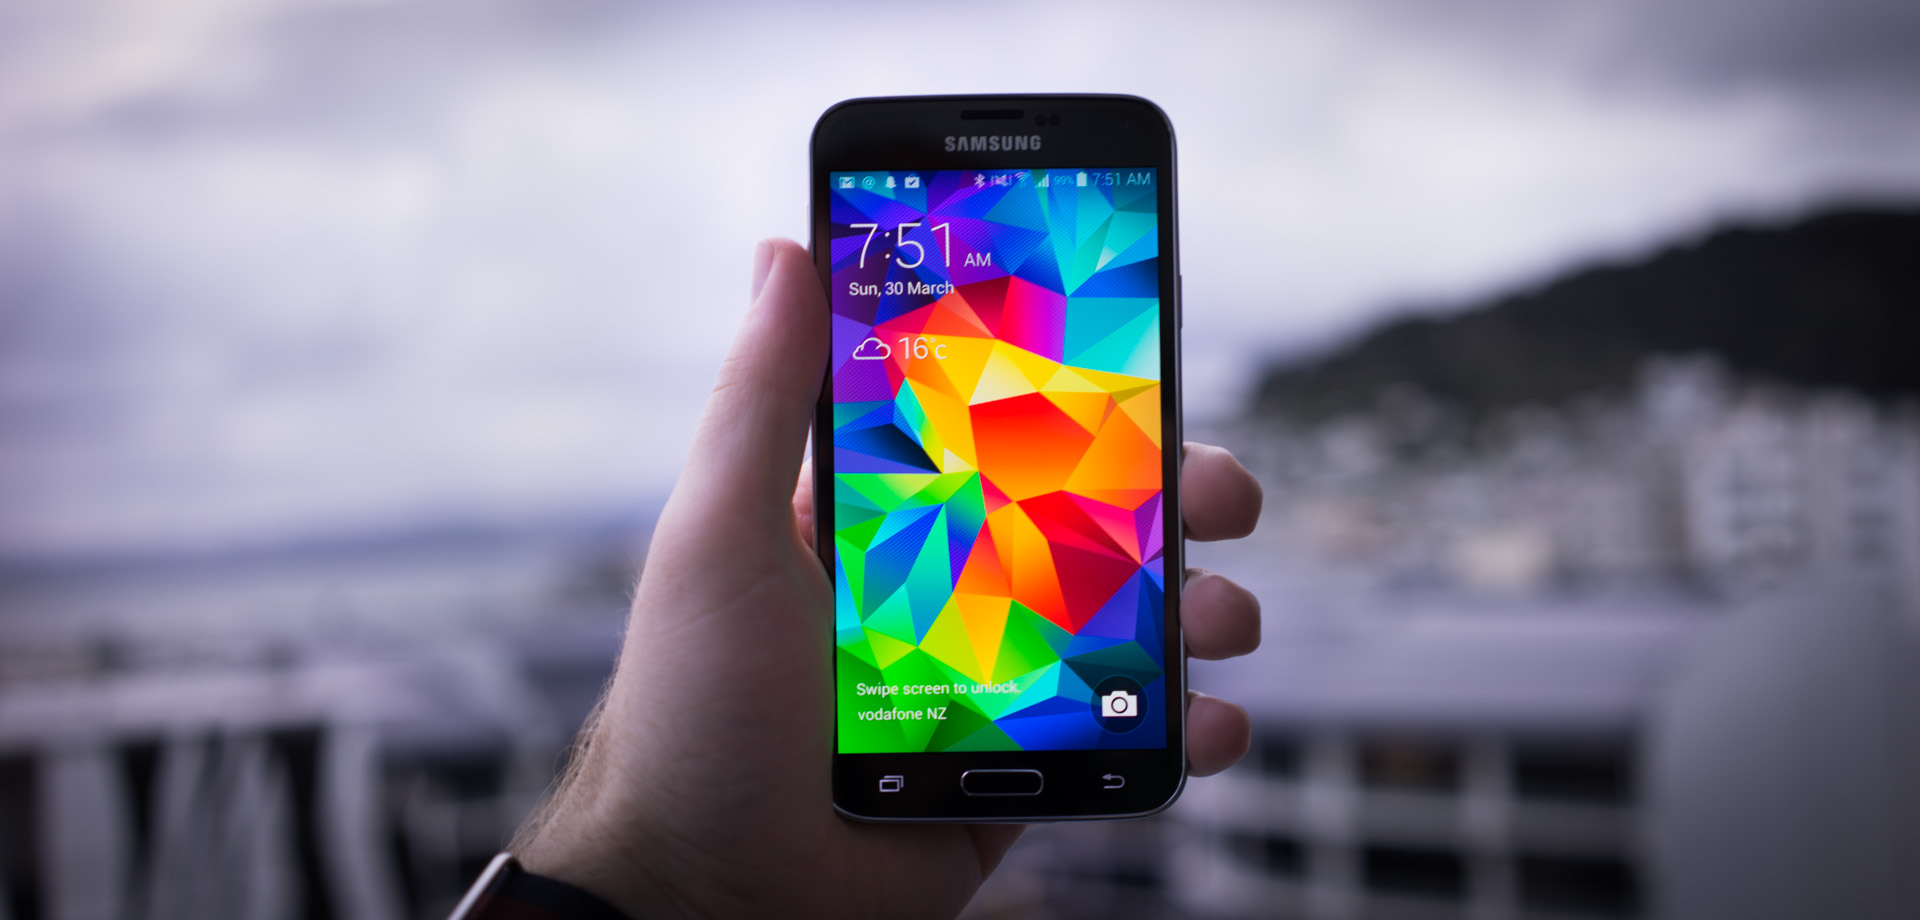 Samsung Galaxy S5 Goes on Sale Worldwide